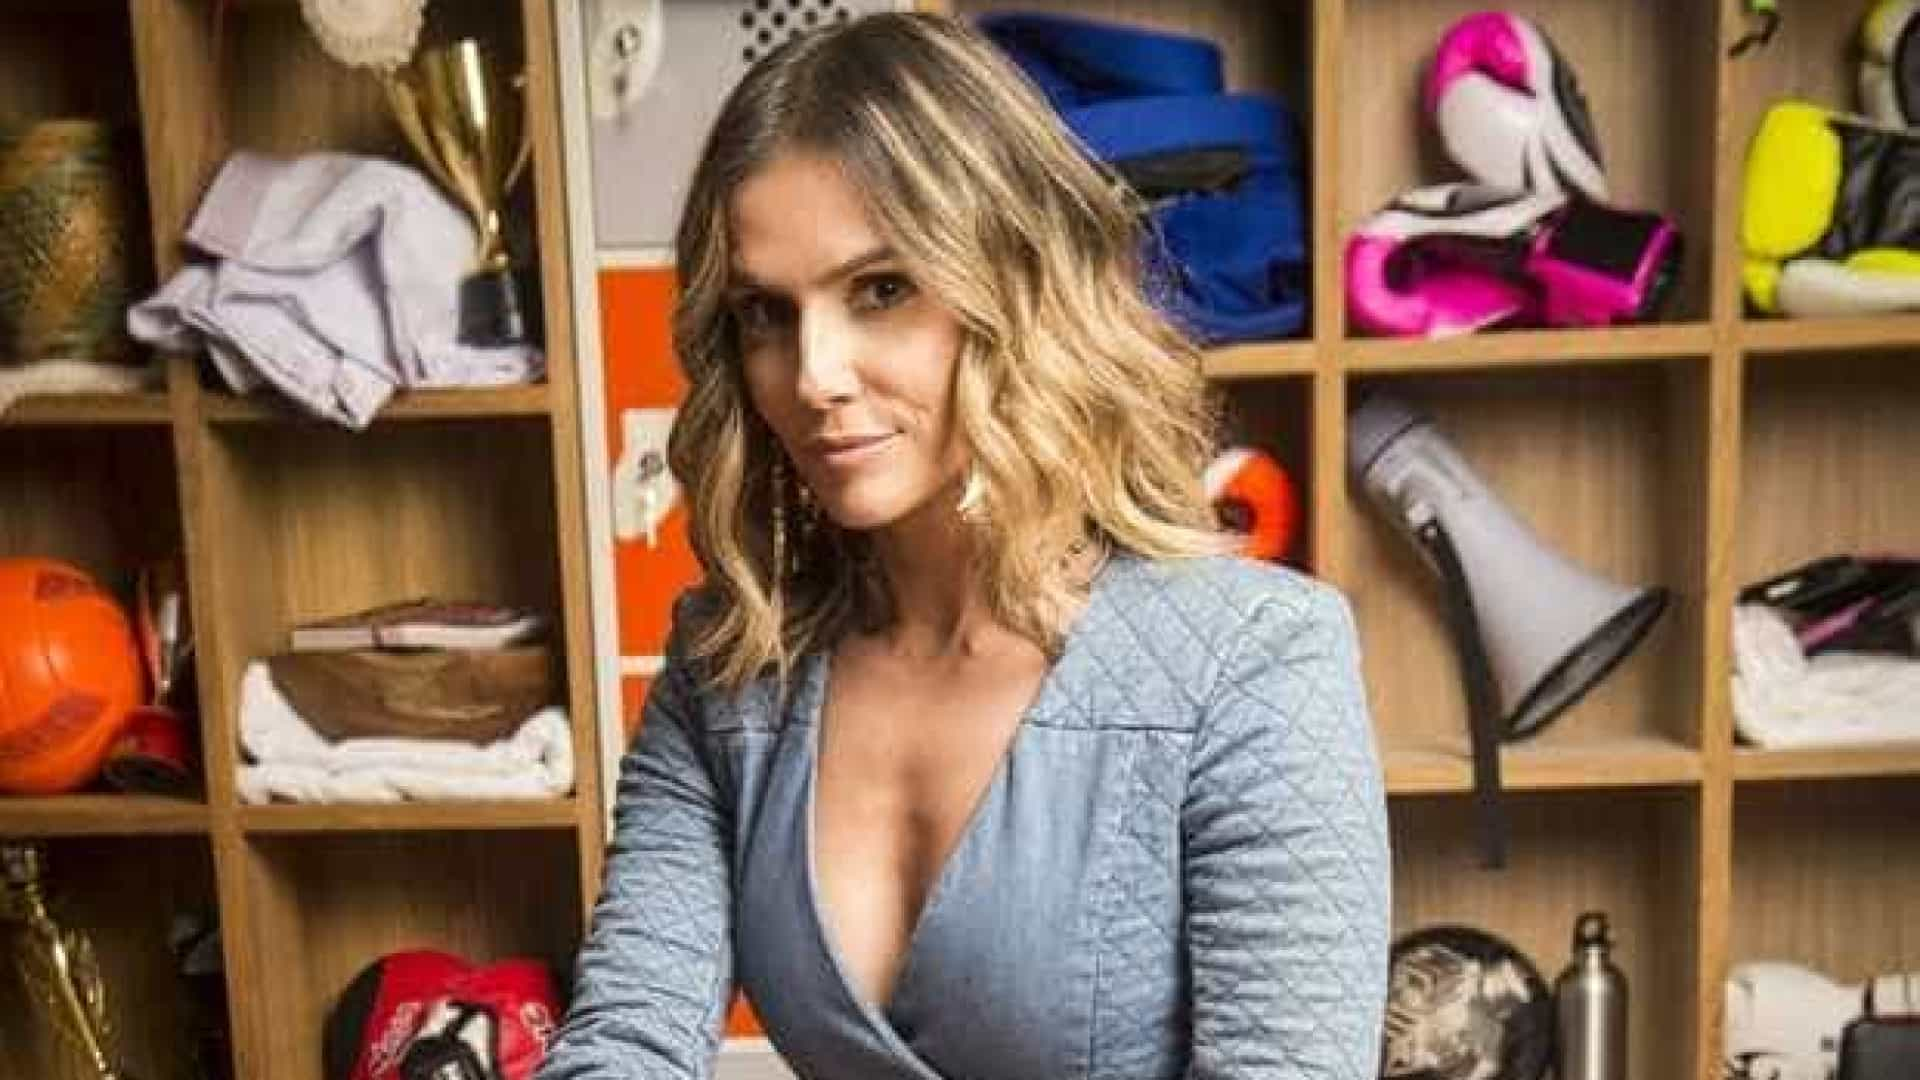 Deborah Secco lamenta homofobia em seu perfil: 'Vim pedir desculpas'